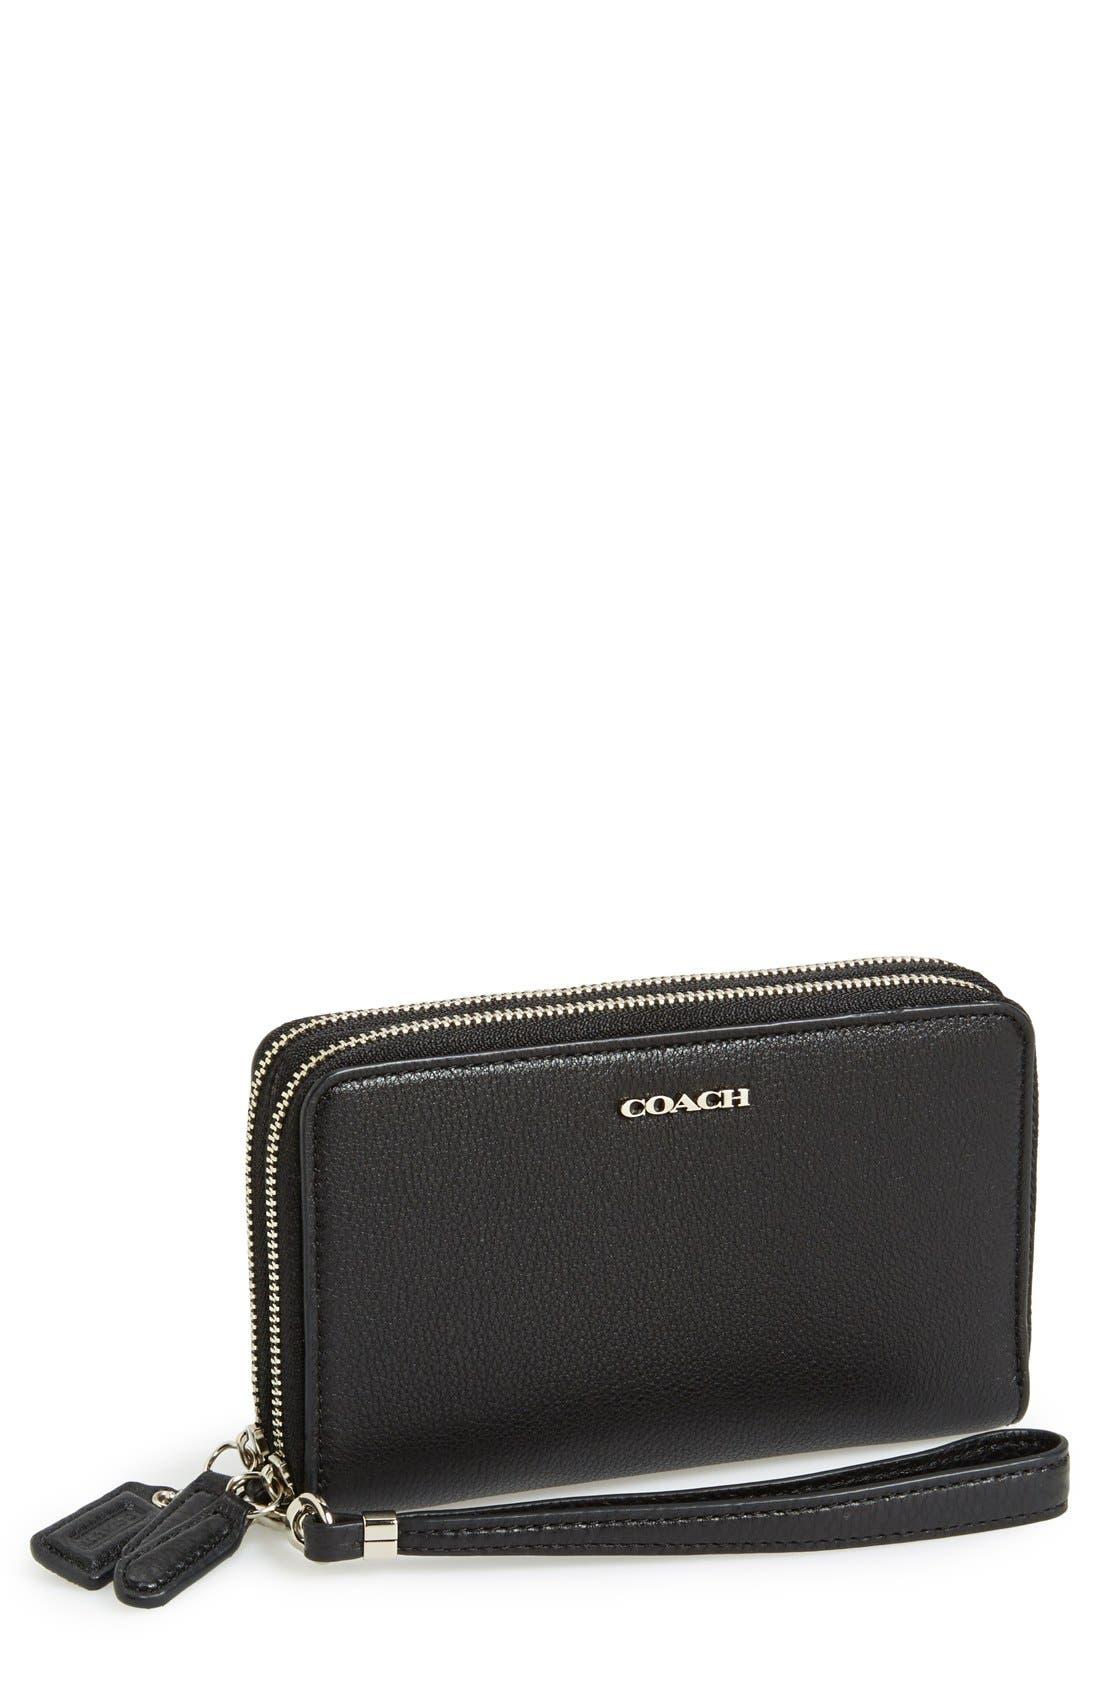 Alternate Image 1 Selected - COACH 'Madison' Zip Around Leather Phone Wristlet